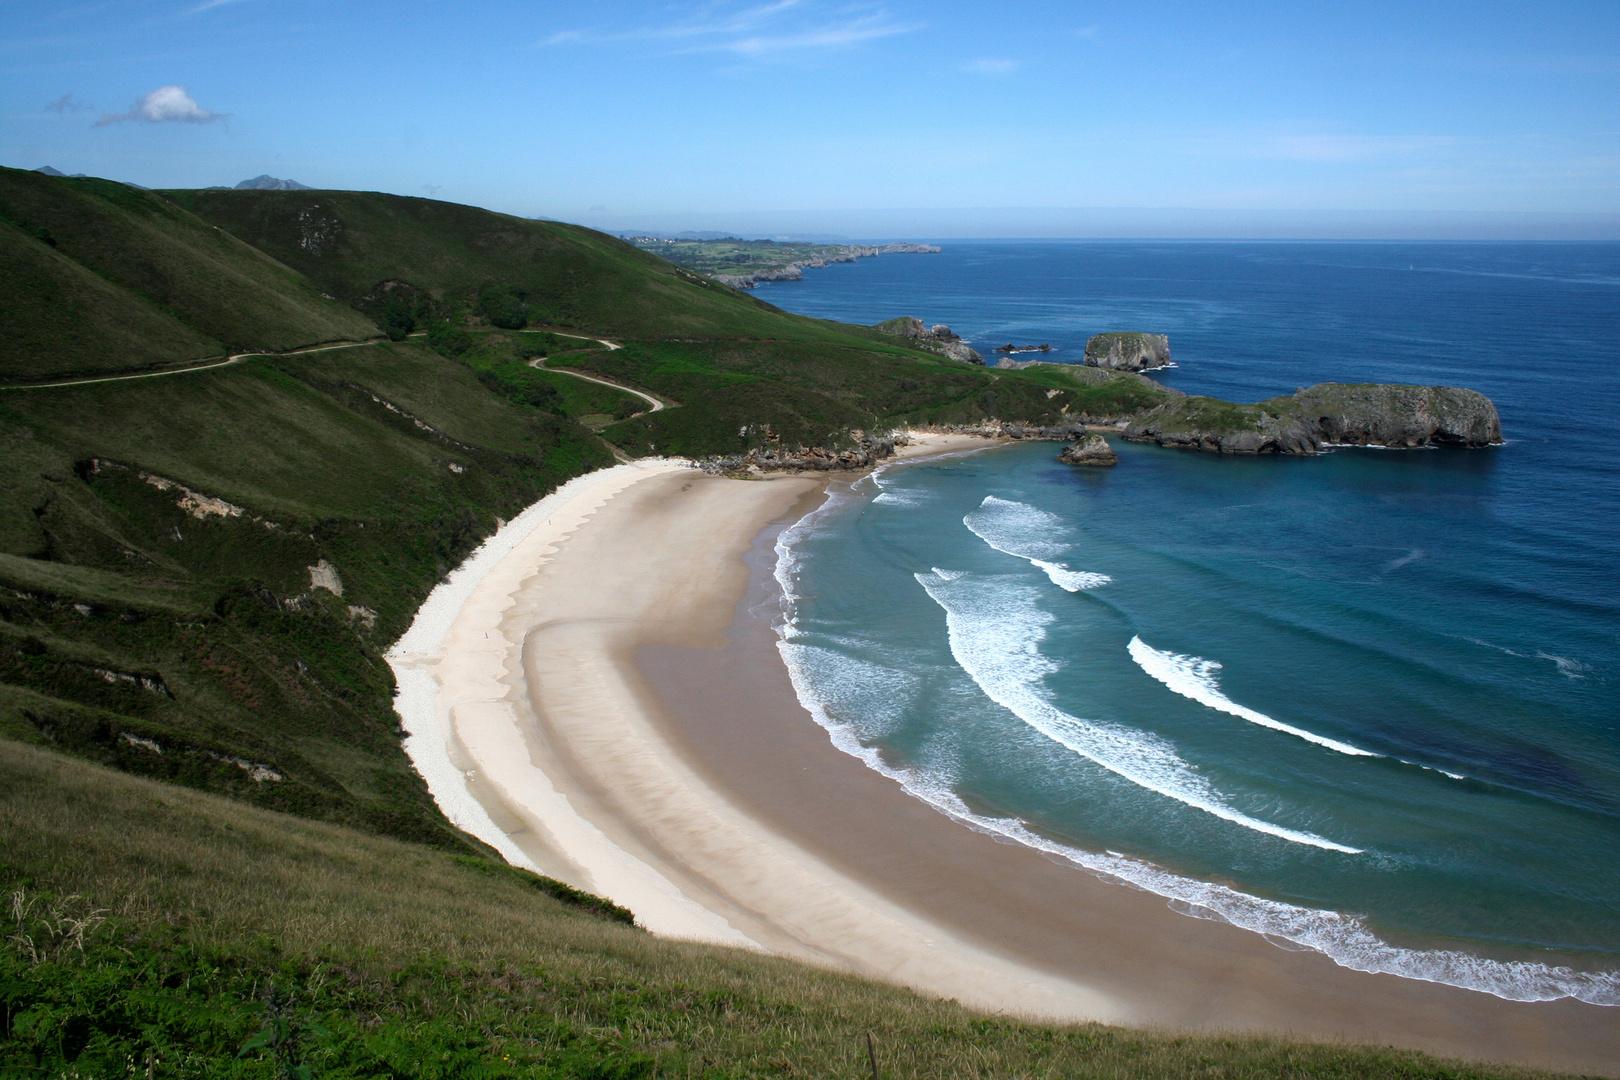 Playa de Torimbia - 2017